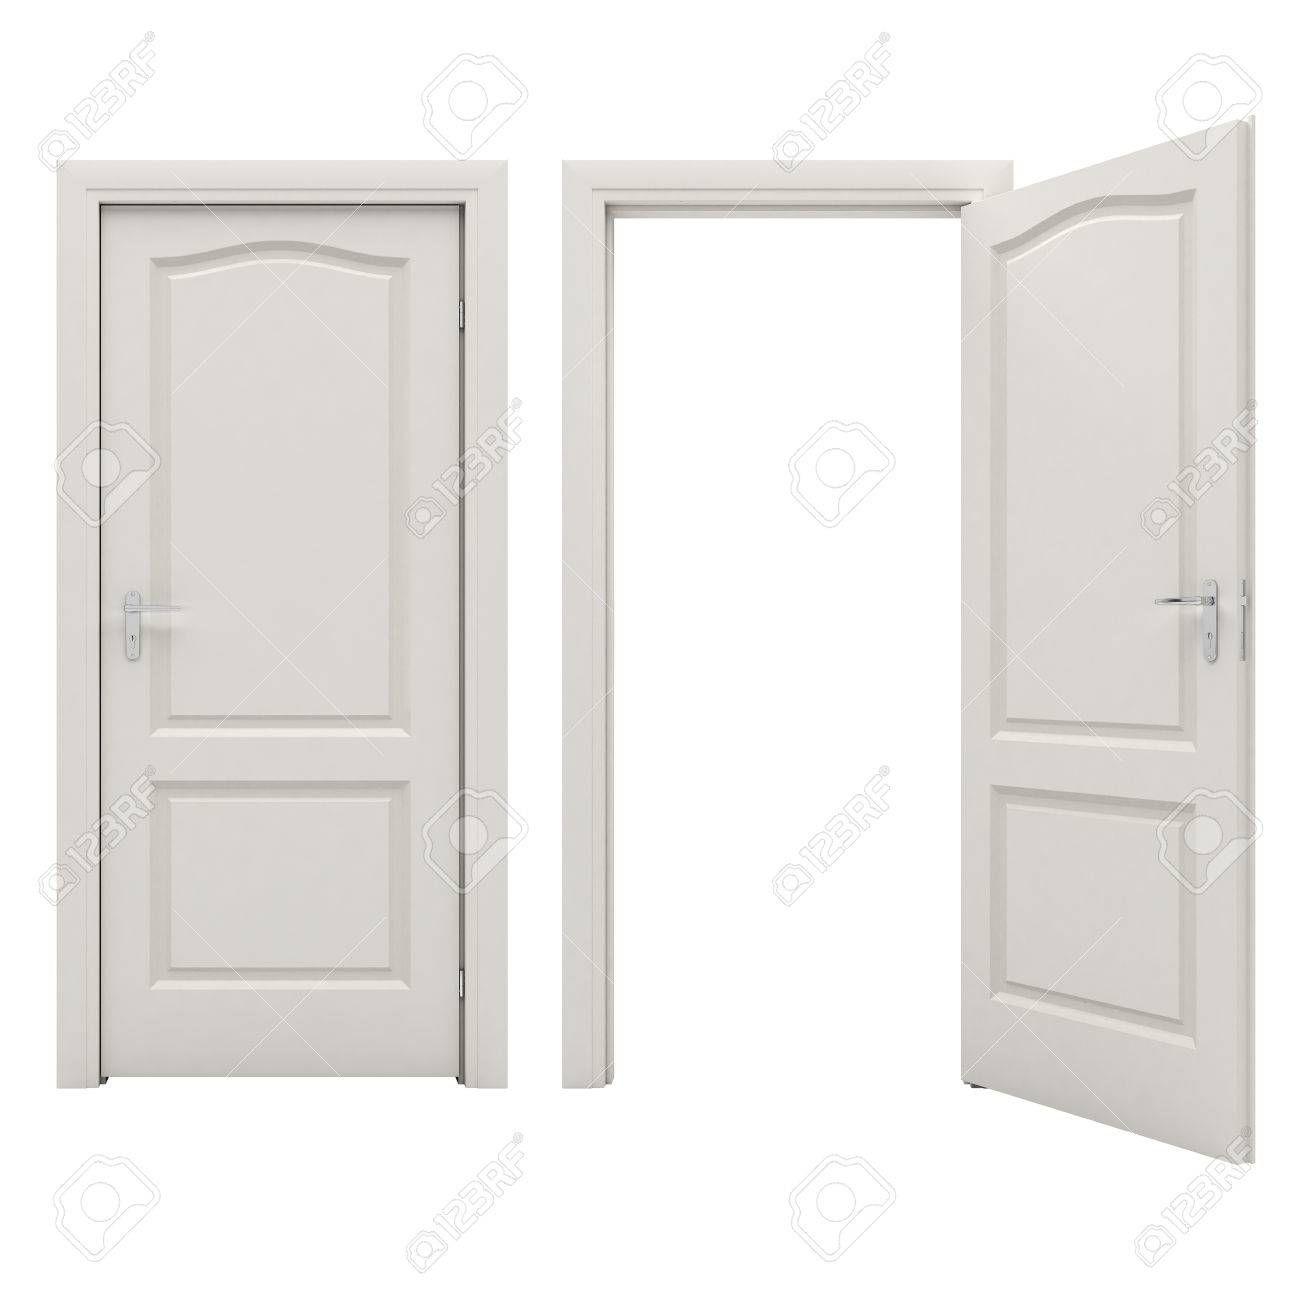 Open White Door Stock Photo Affiliate White Open Door Photo Stock Decor Home Furniture